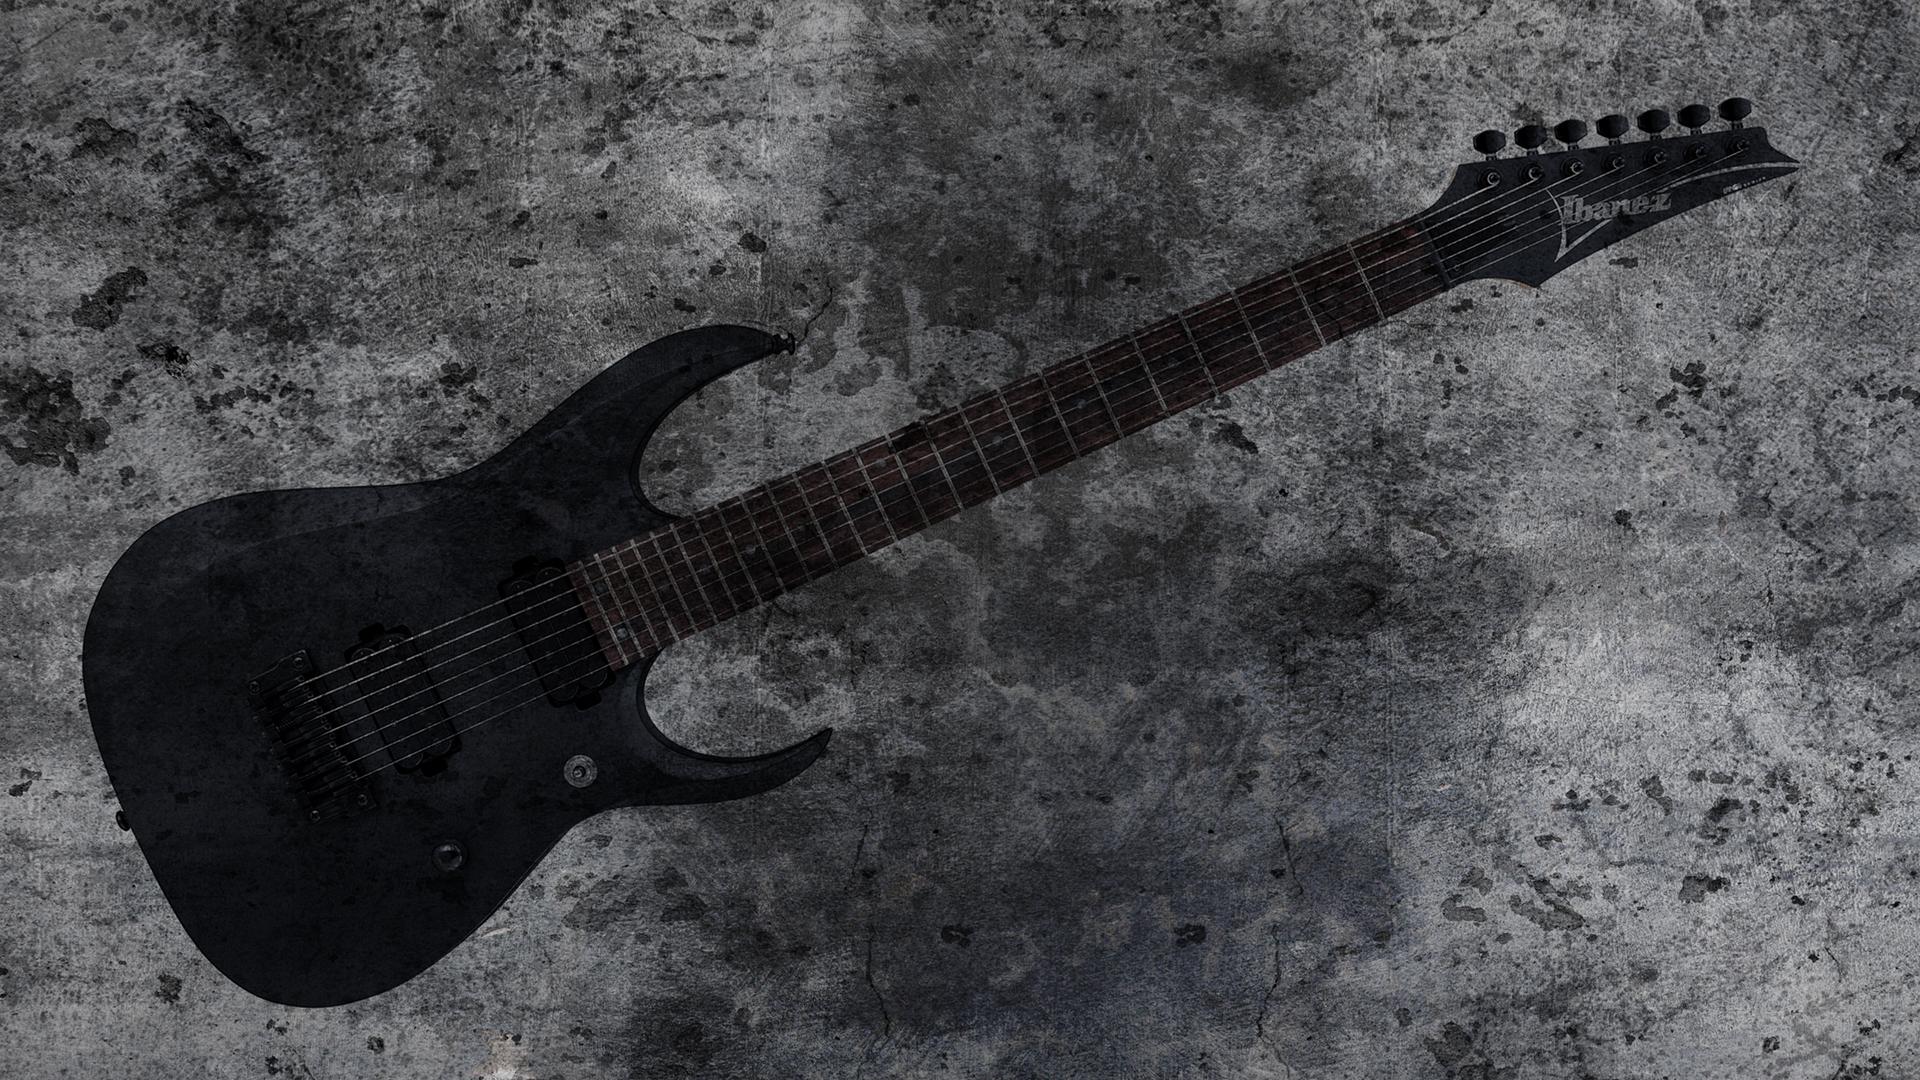 ibanez rgd 7421 e guitar wallpaper 1 by jaxxtraxx on deviantart